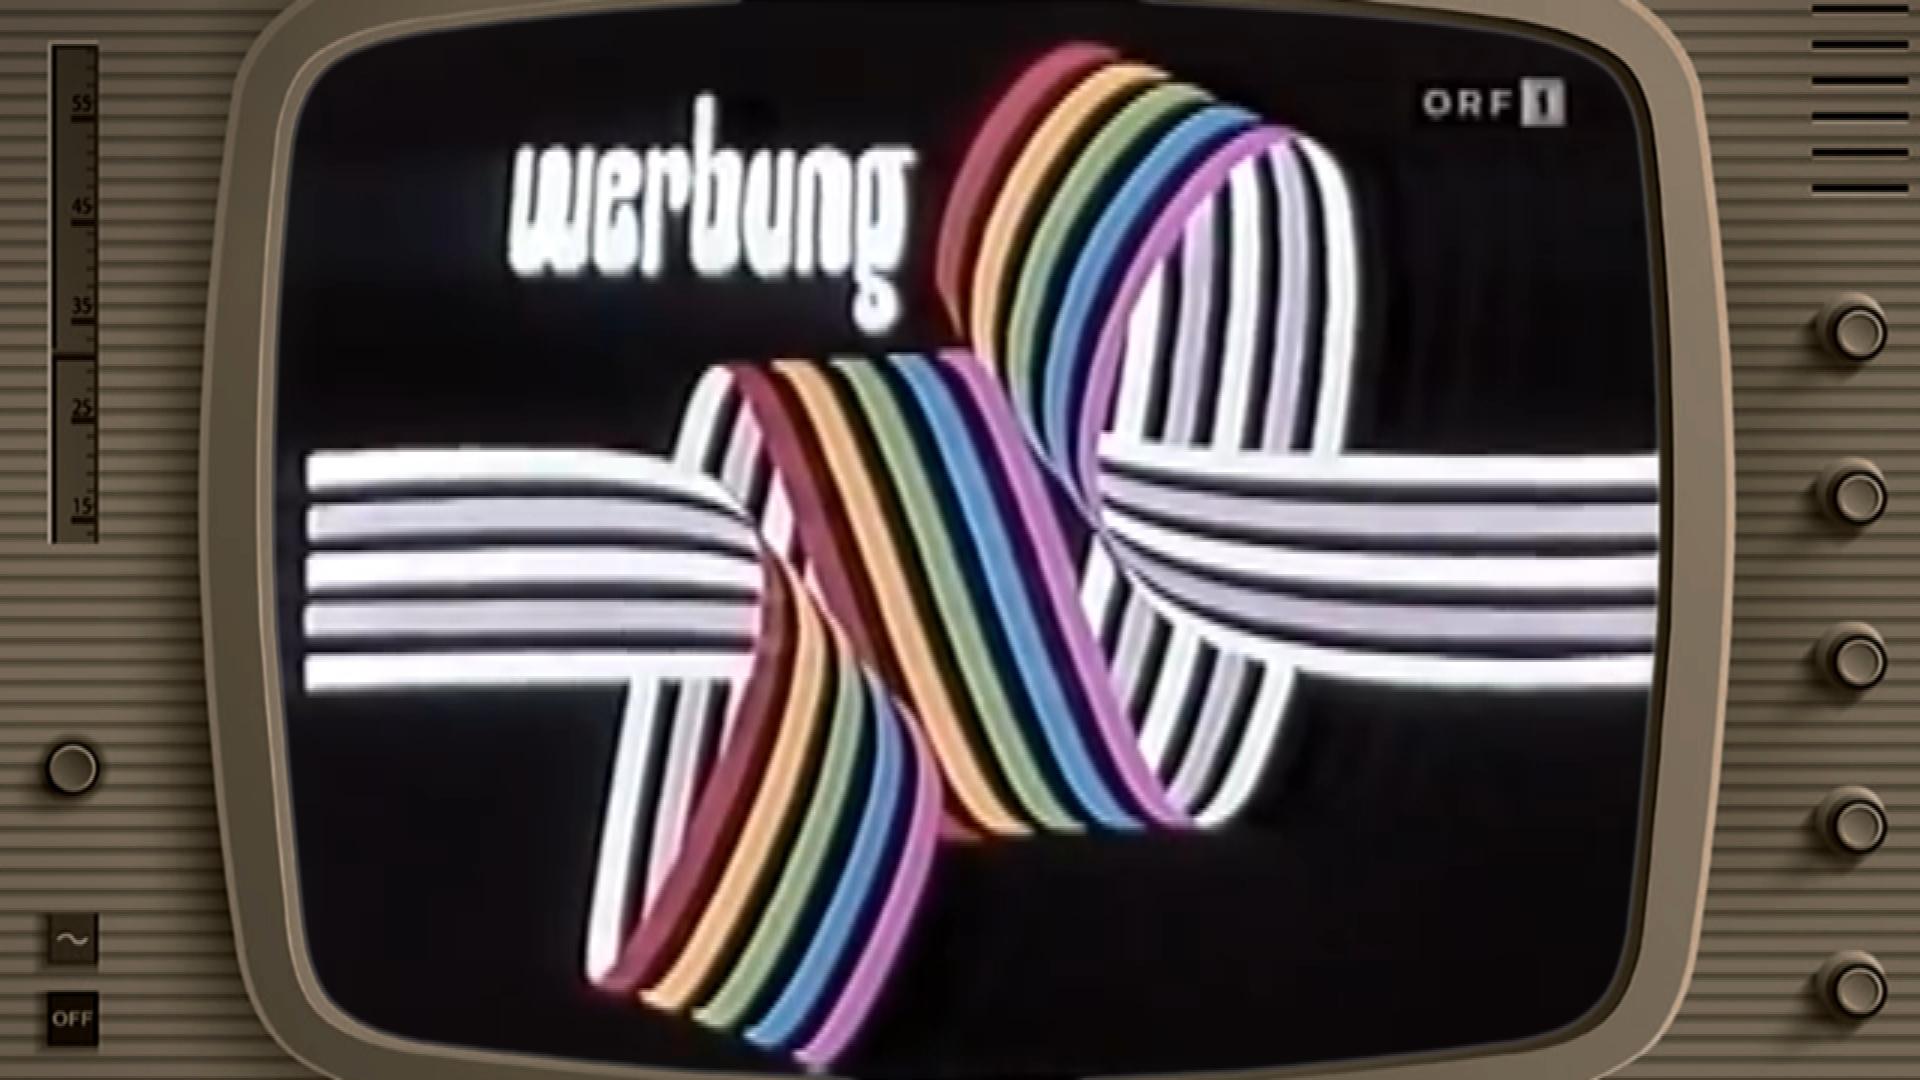 7 Fernsehn zum Gernsehn F01 FINAL 200426 Copy 01